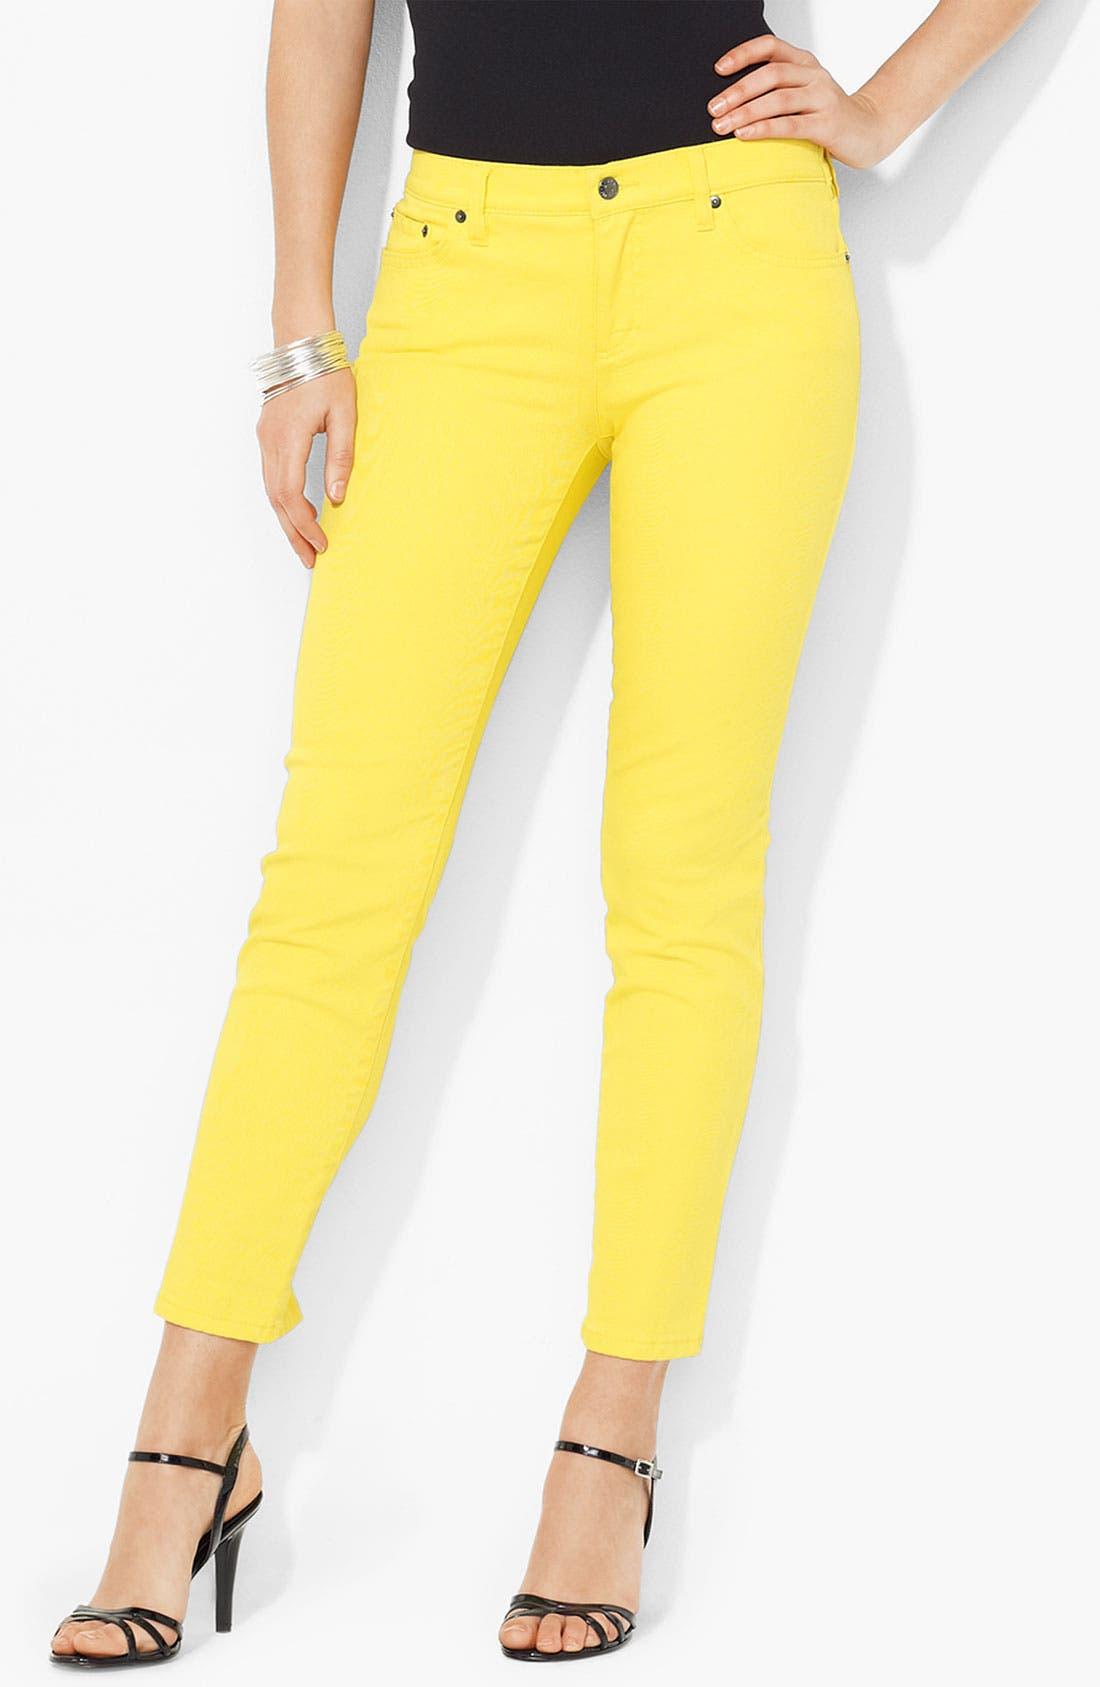 Main Image - Lauren Ralph Lauren Slimming Straight Leg Ankle Pants (Petite) (Online Exclusive)